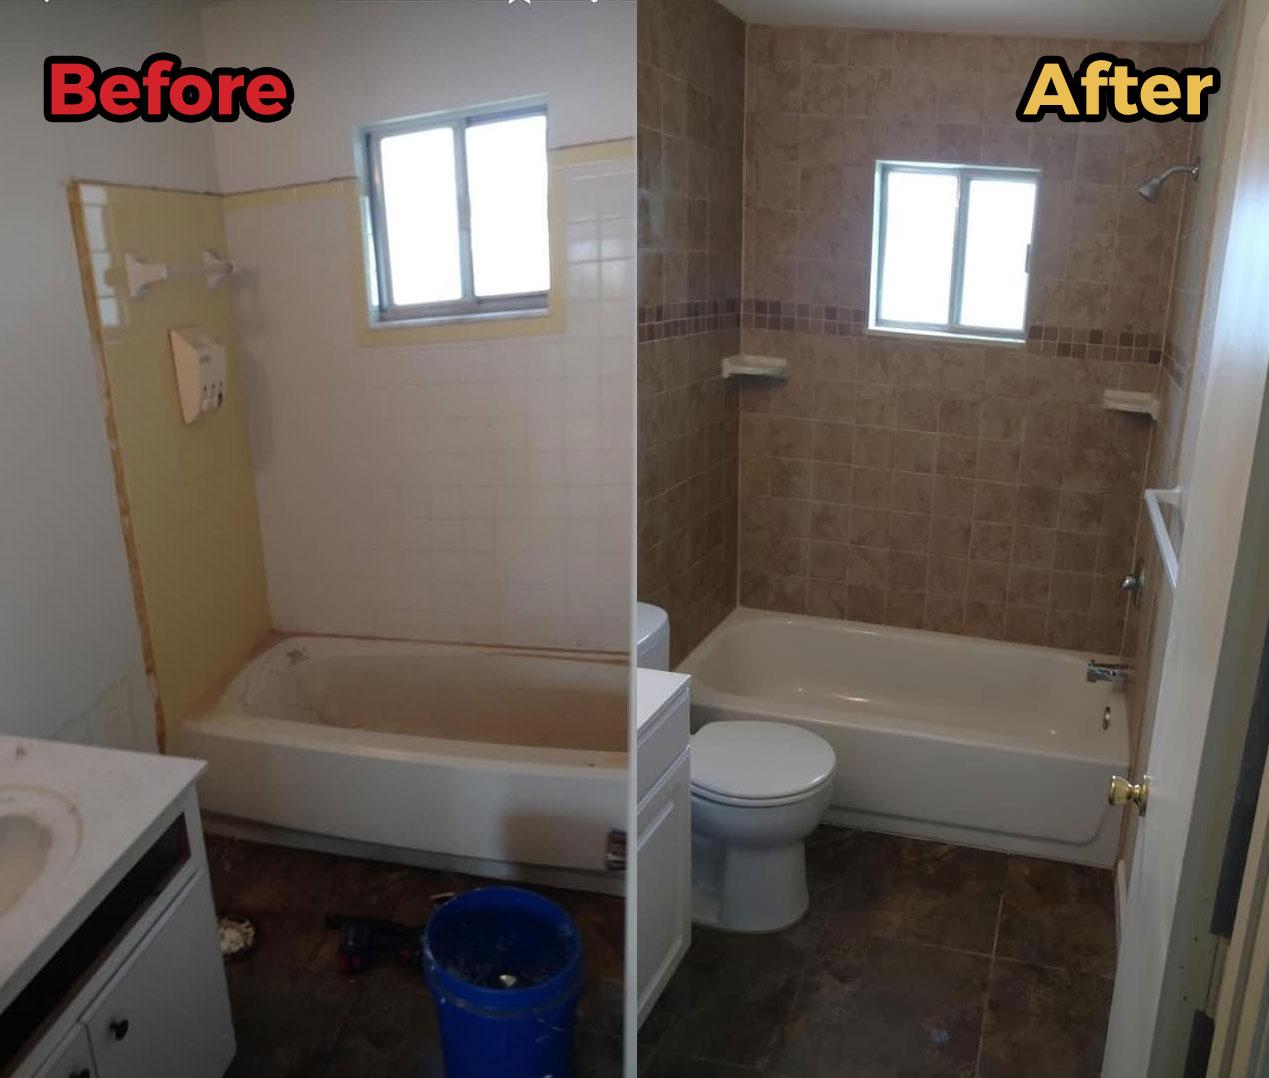 Bathroom tub remodel before/after